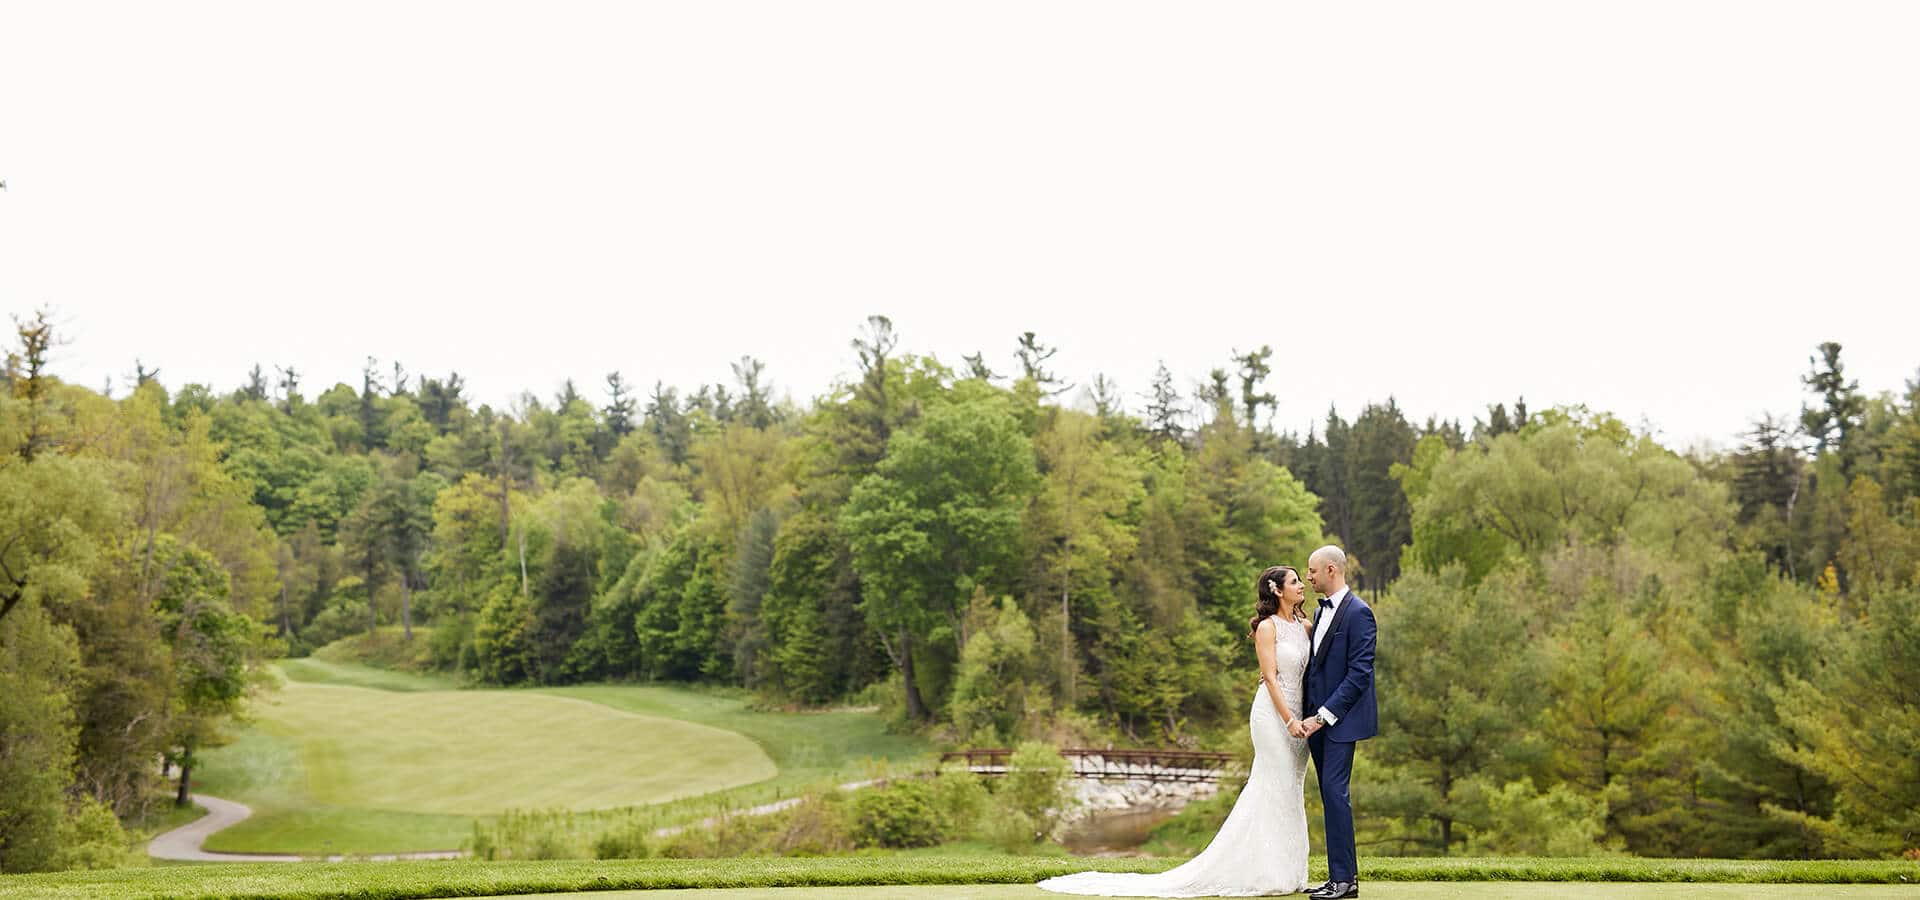 Hero image for Stefanie and Mark's Elegant Wedding at Copper Creek